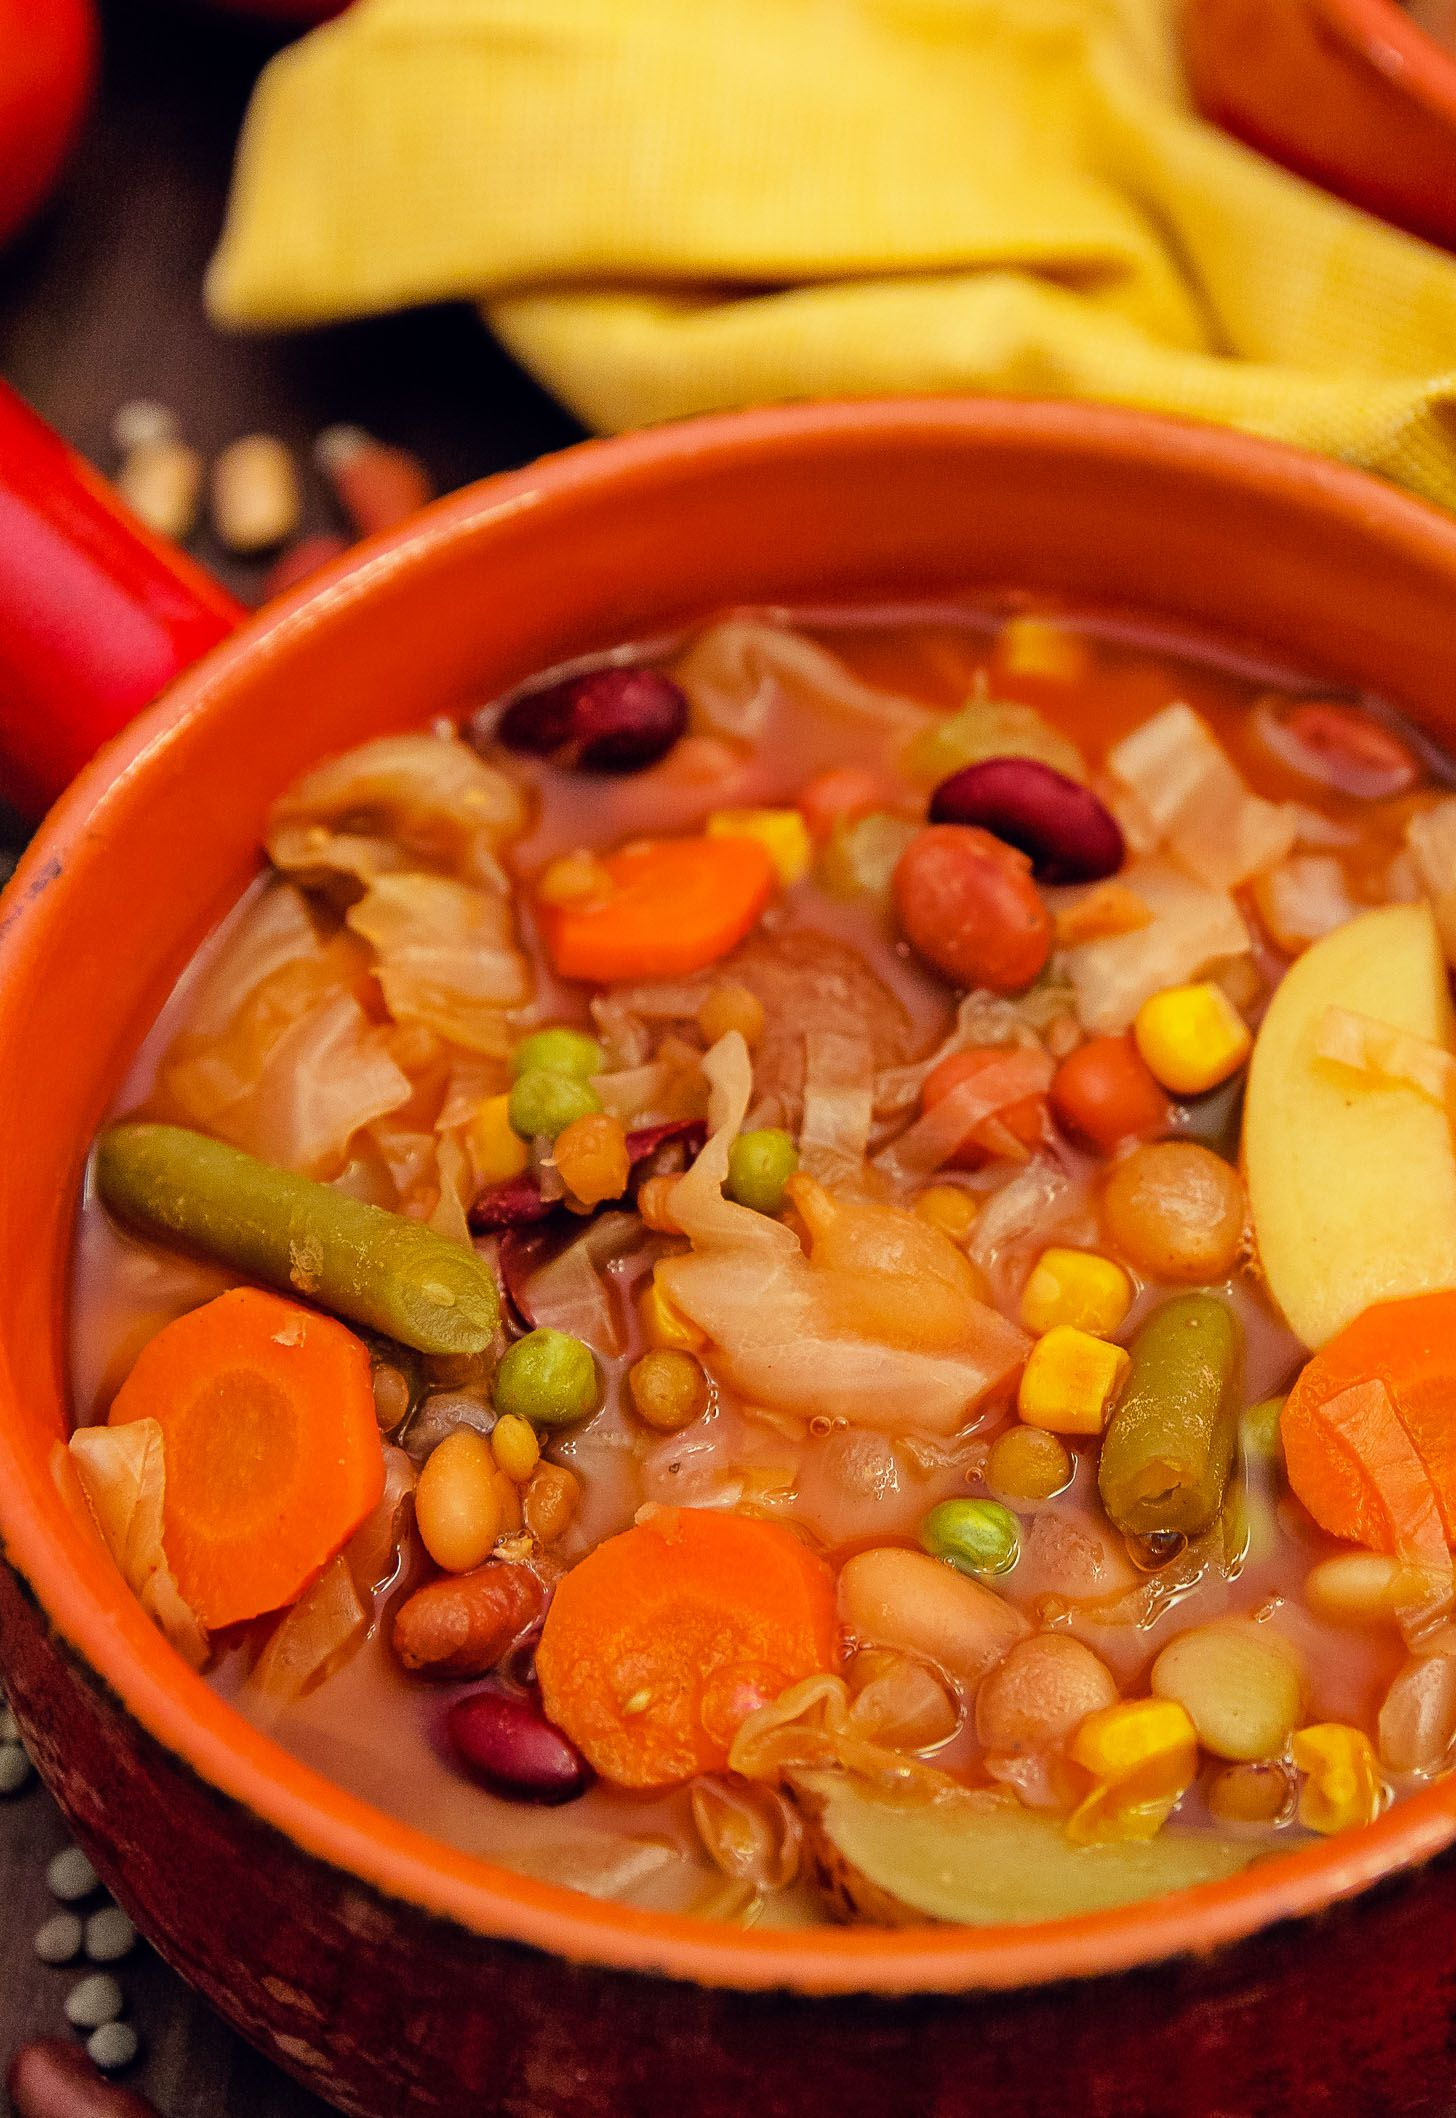 Detox Soup Monkey And Me Kitchen Adventures Recipe Whole Food Recipes Detox Soup Cabbage Vegetable Soup Recipes